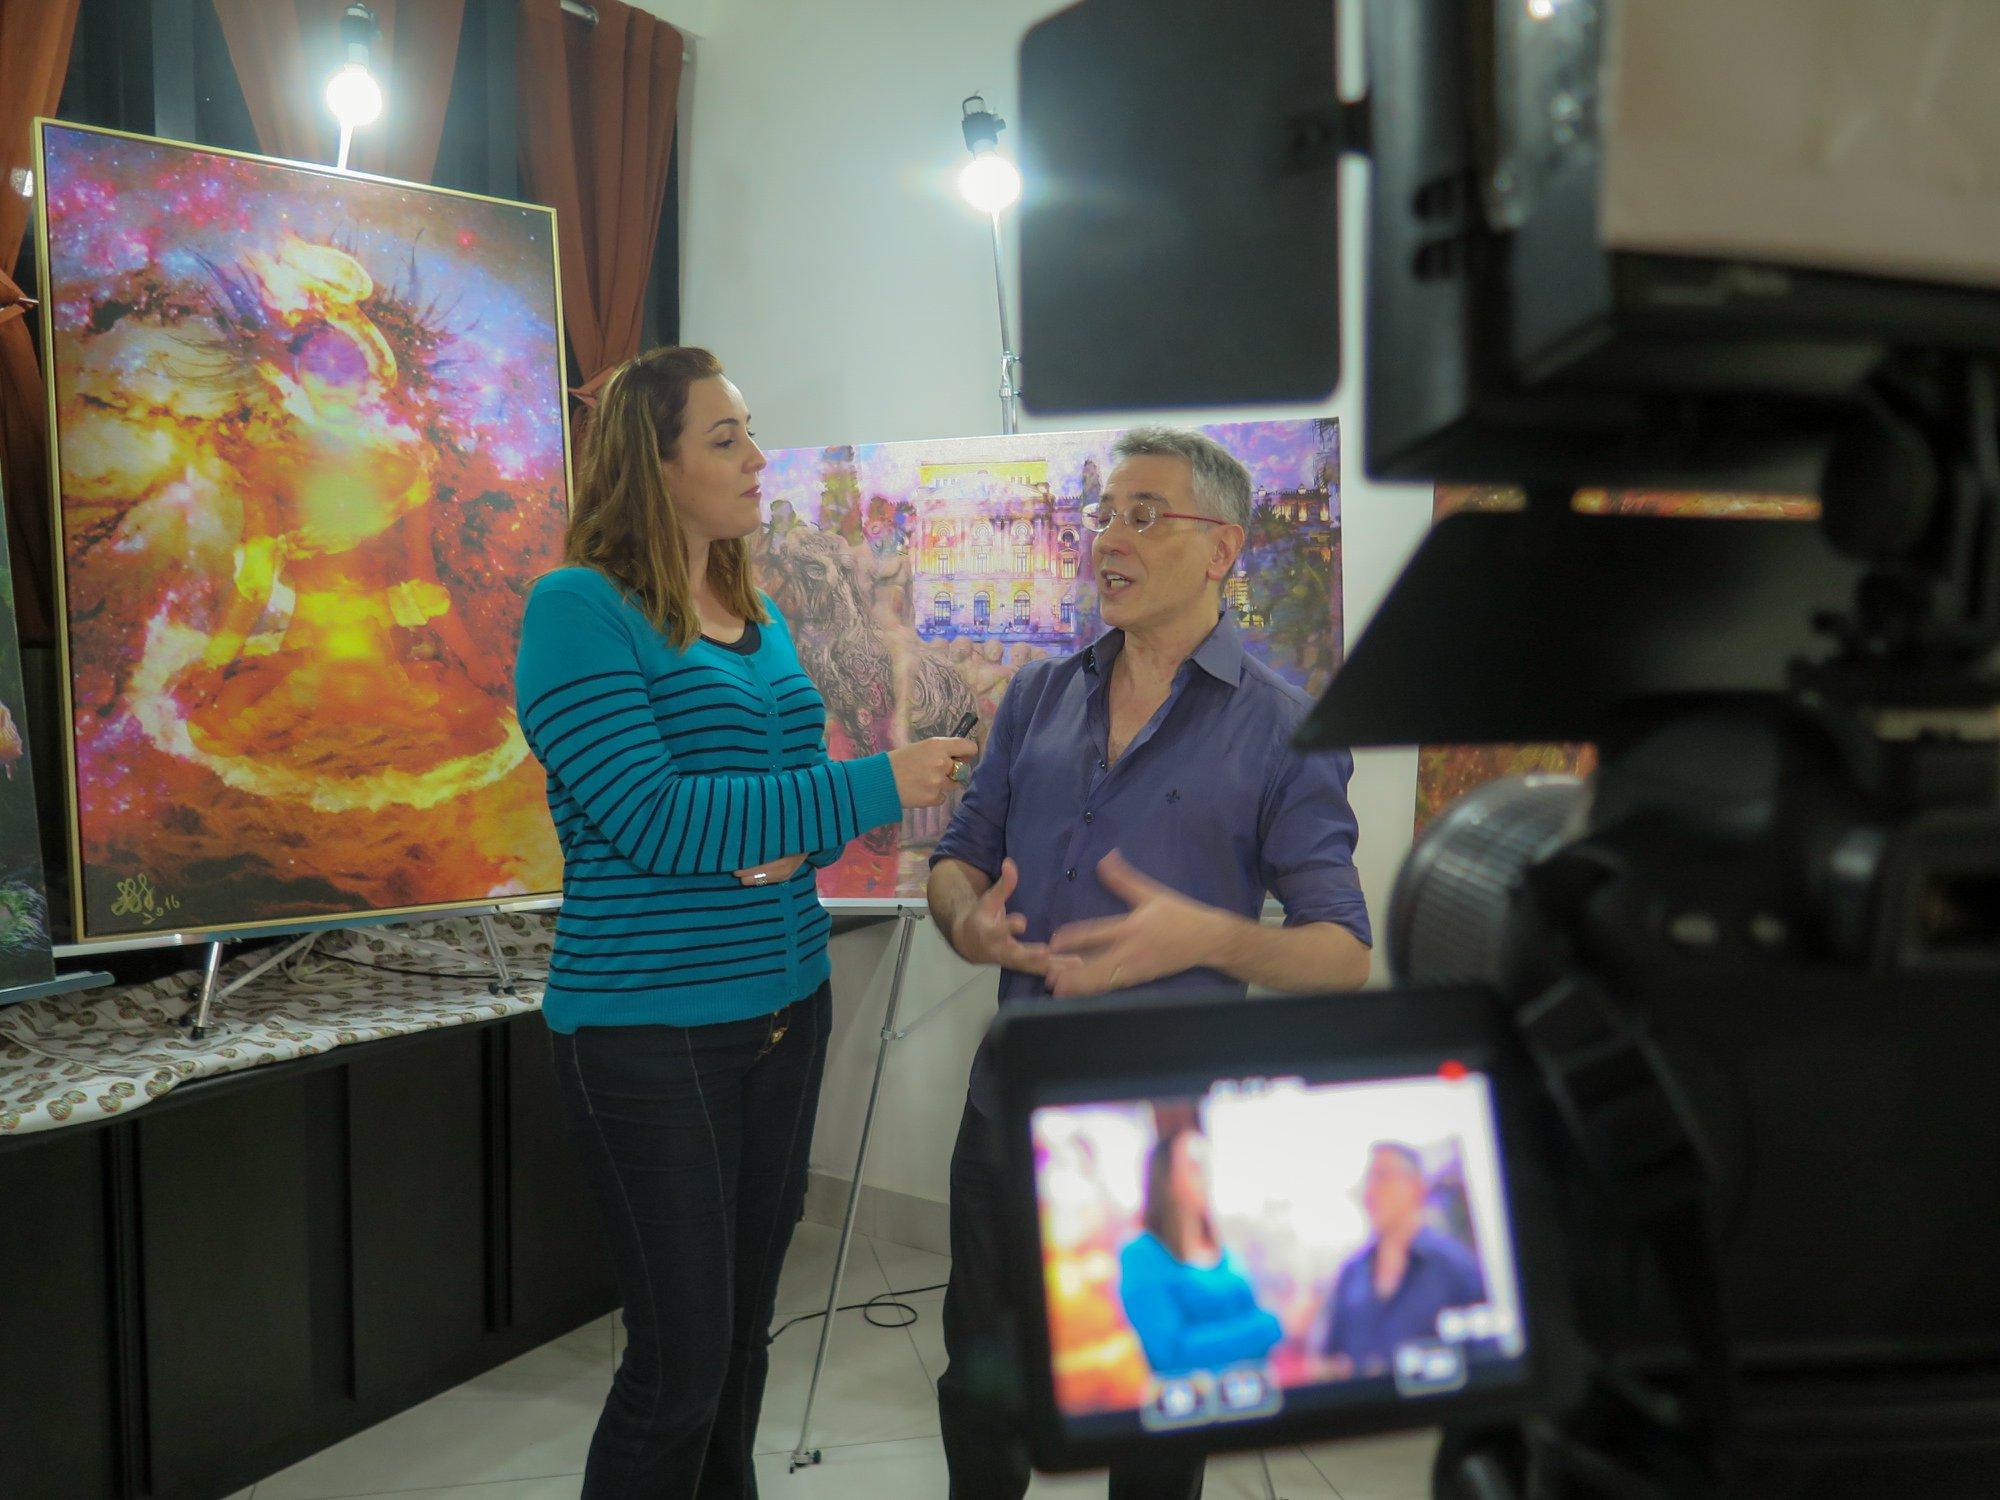 O Artista Plástico e Psicanalista Henrique Vieira Filho sendo entrevistado sobre o Workshop Arte E Terapia